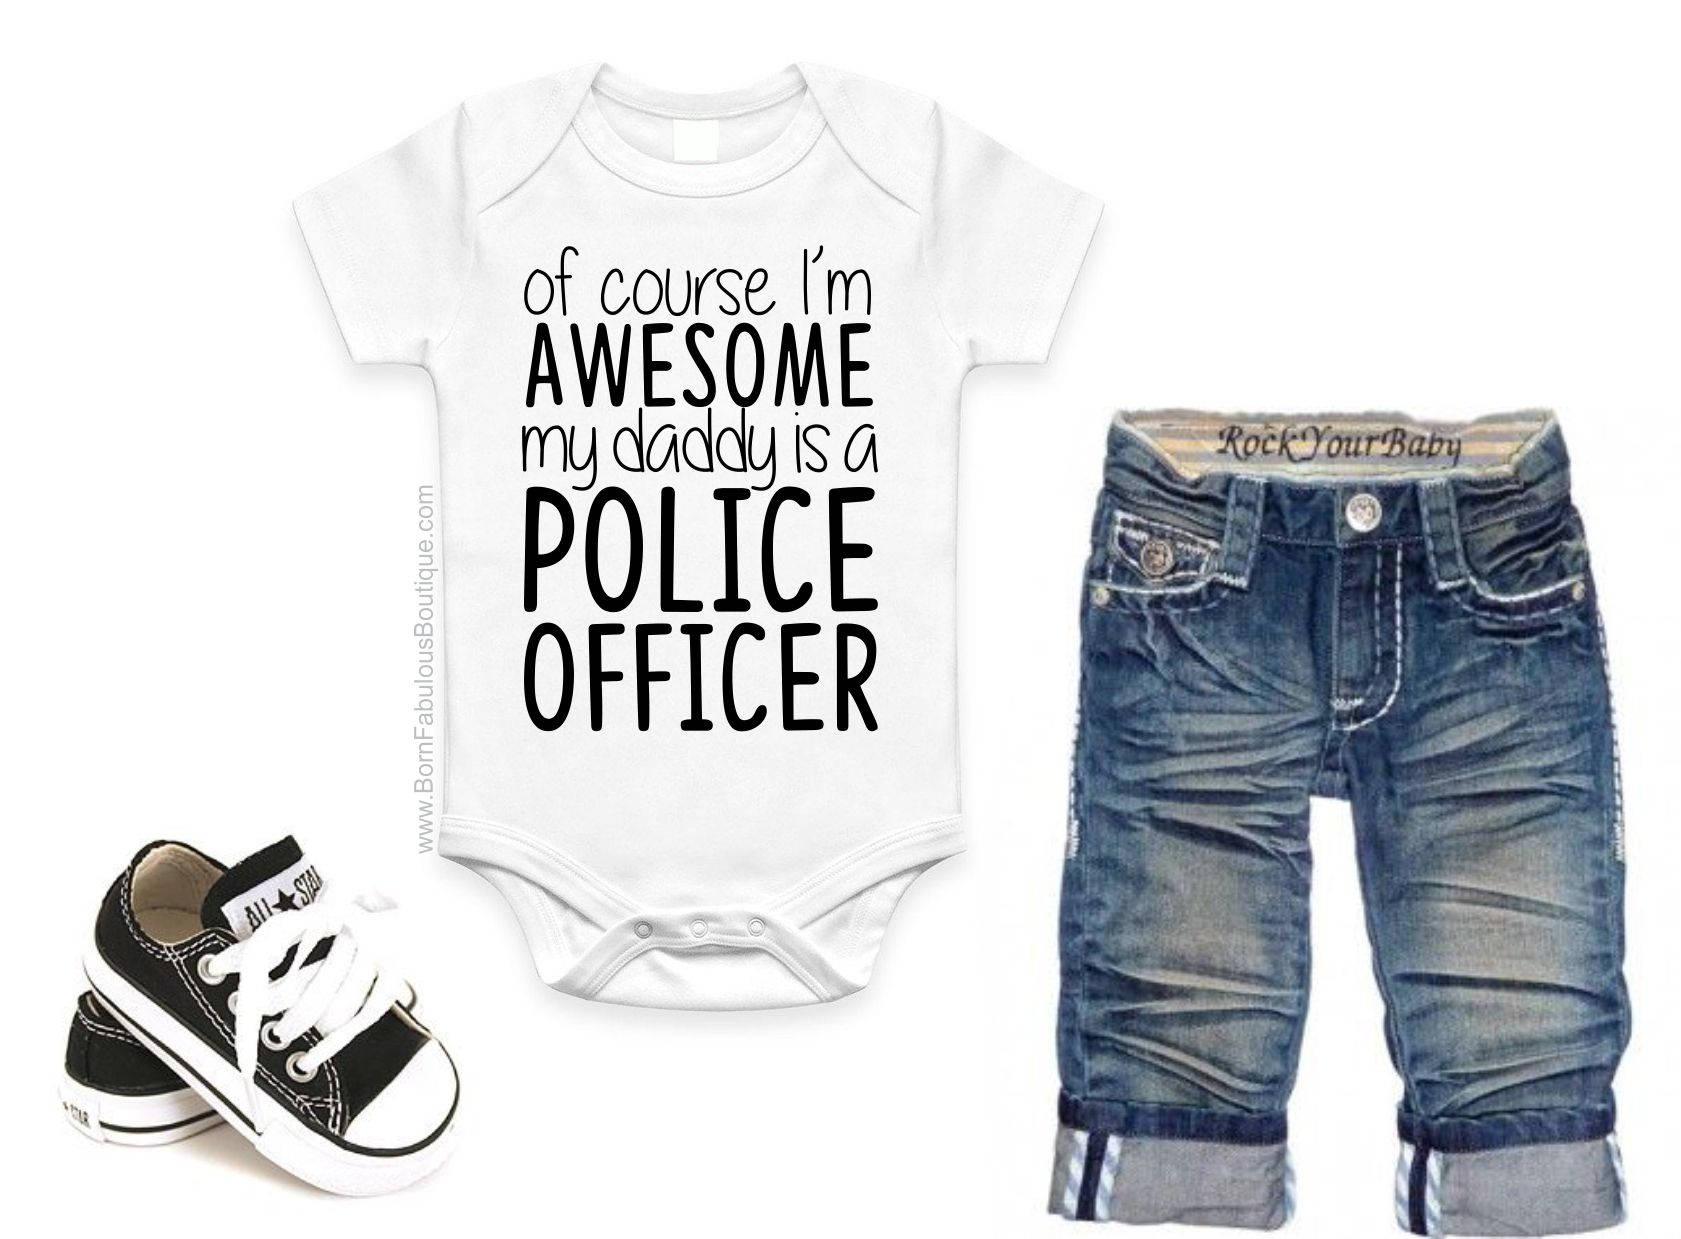 Polizist Geschenk Geschenk zum Vatertag Vatertag Geschenk